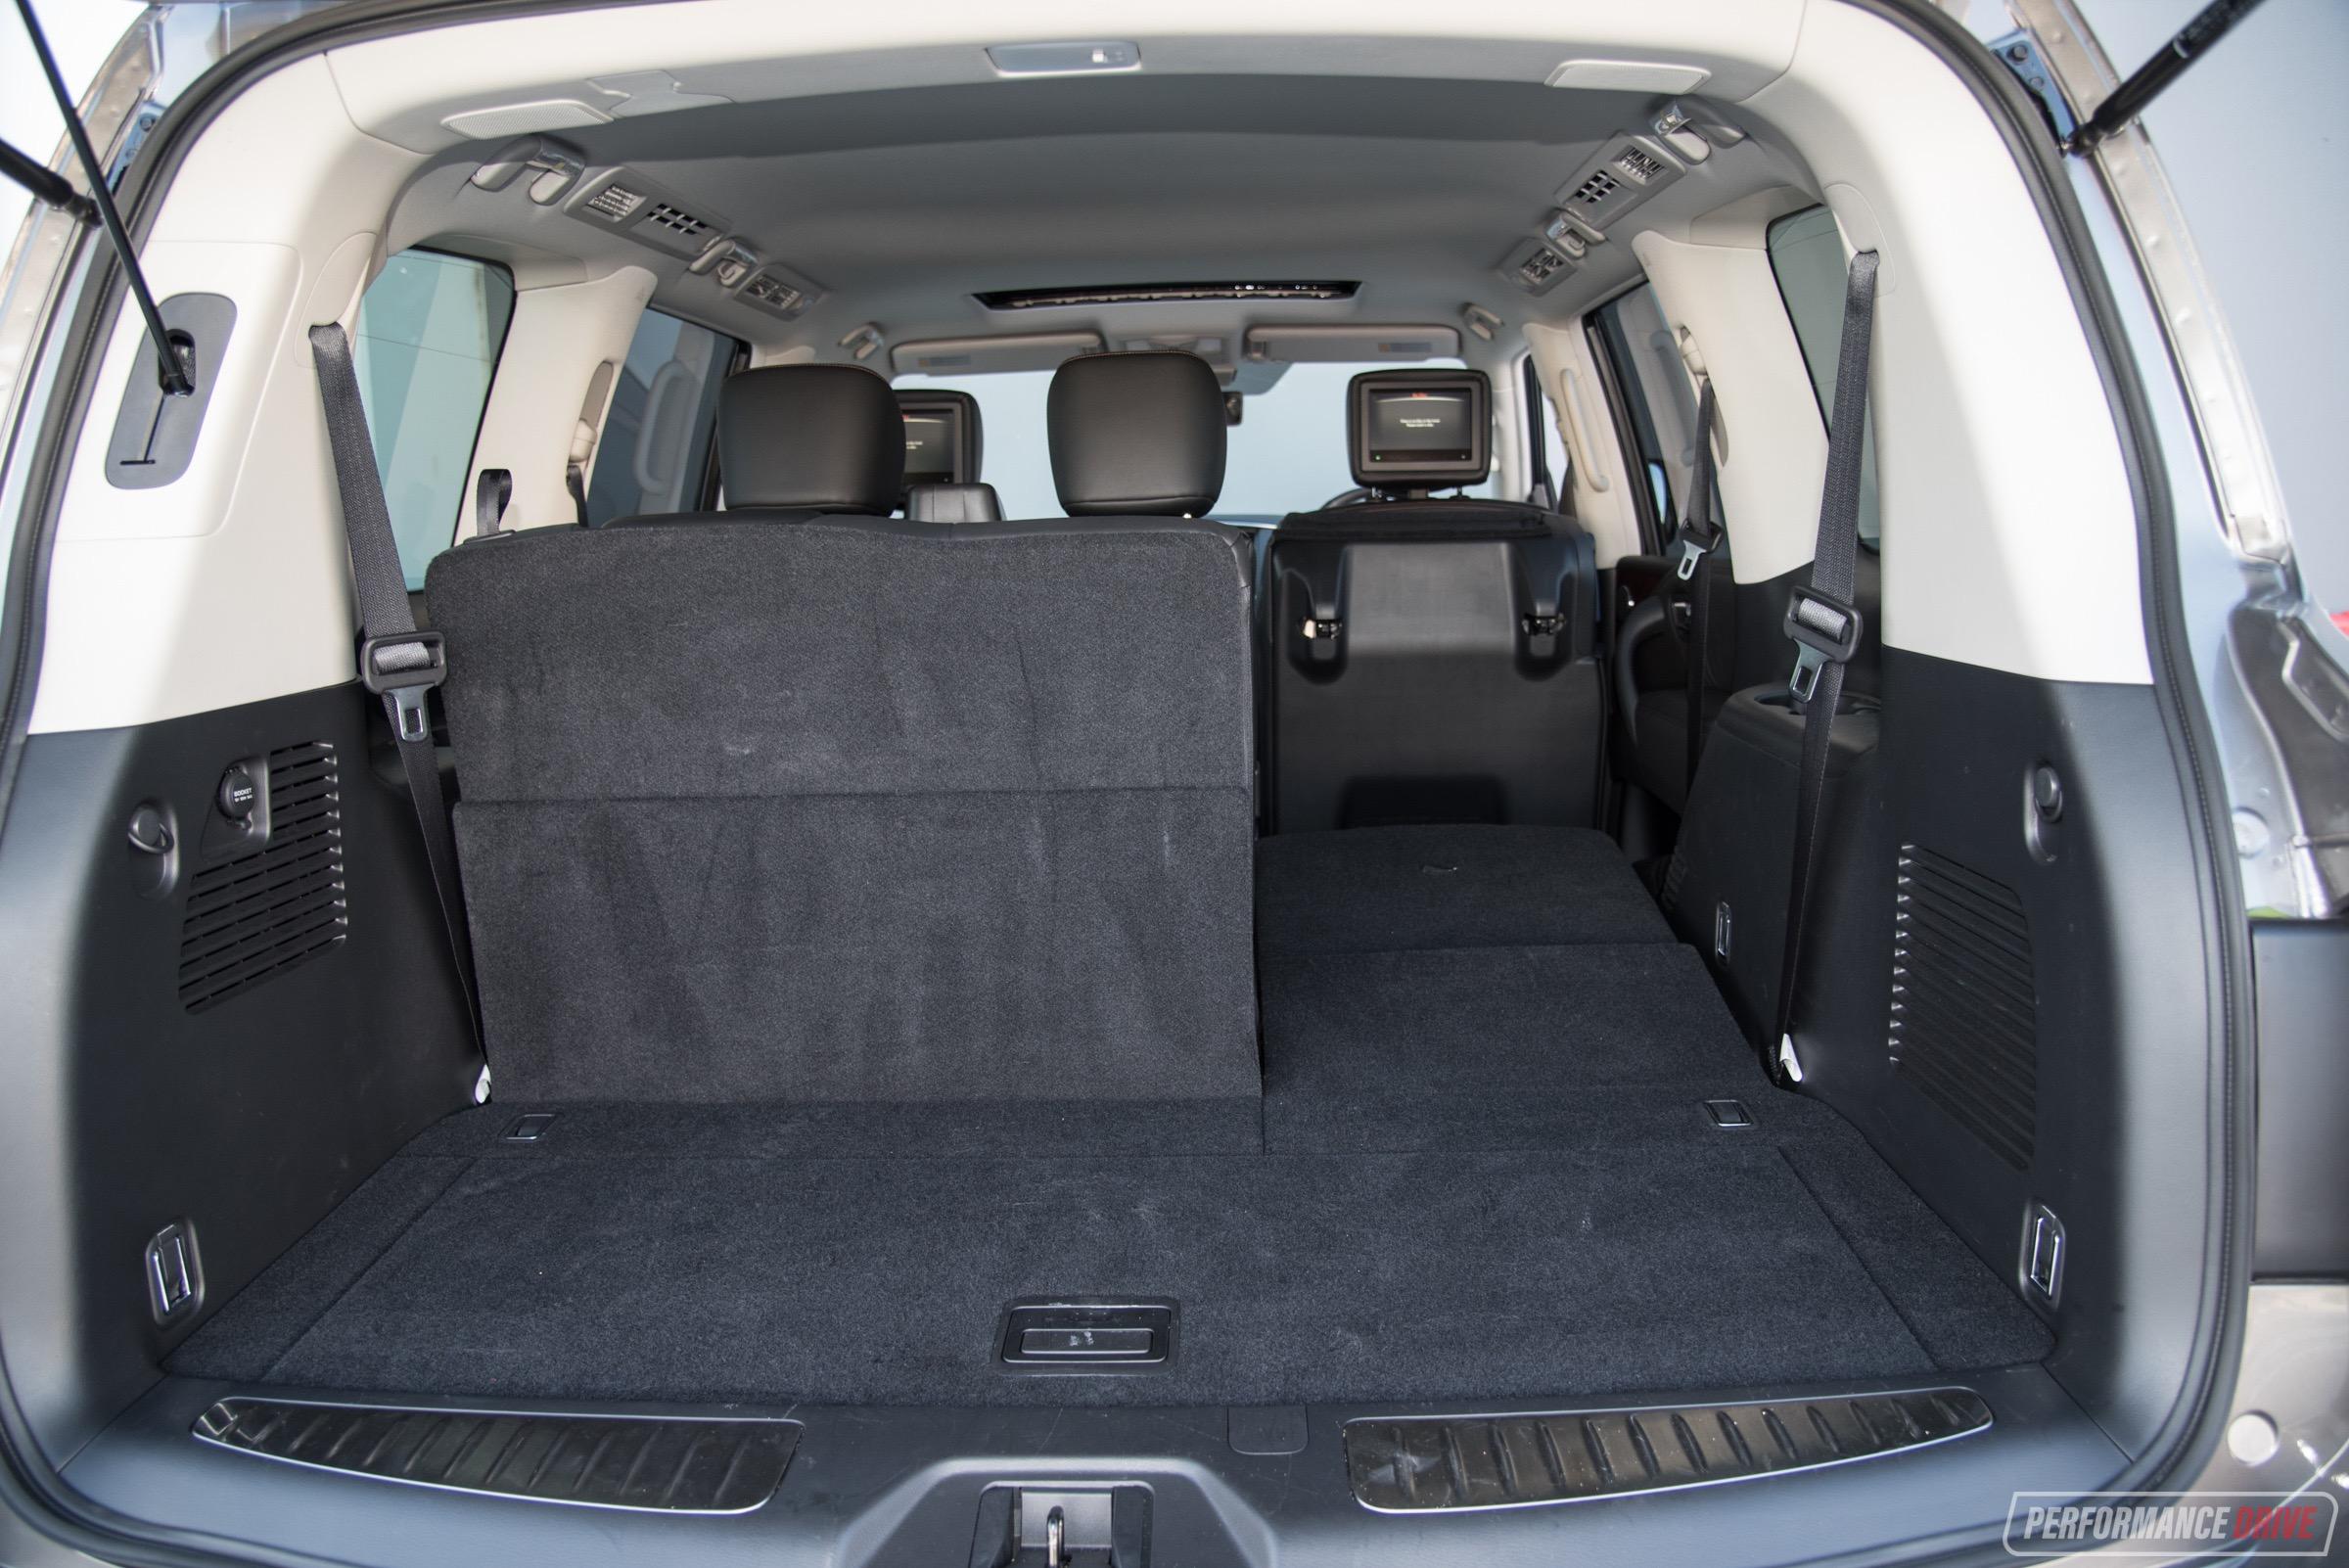 2018 Nissan Patrol Ti-L review (video) | PerformanceDrive